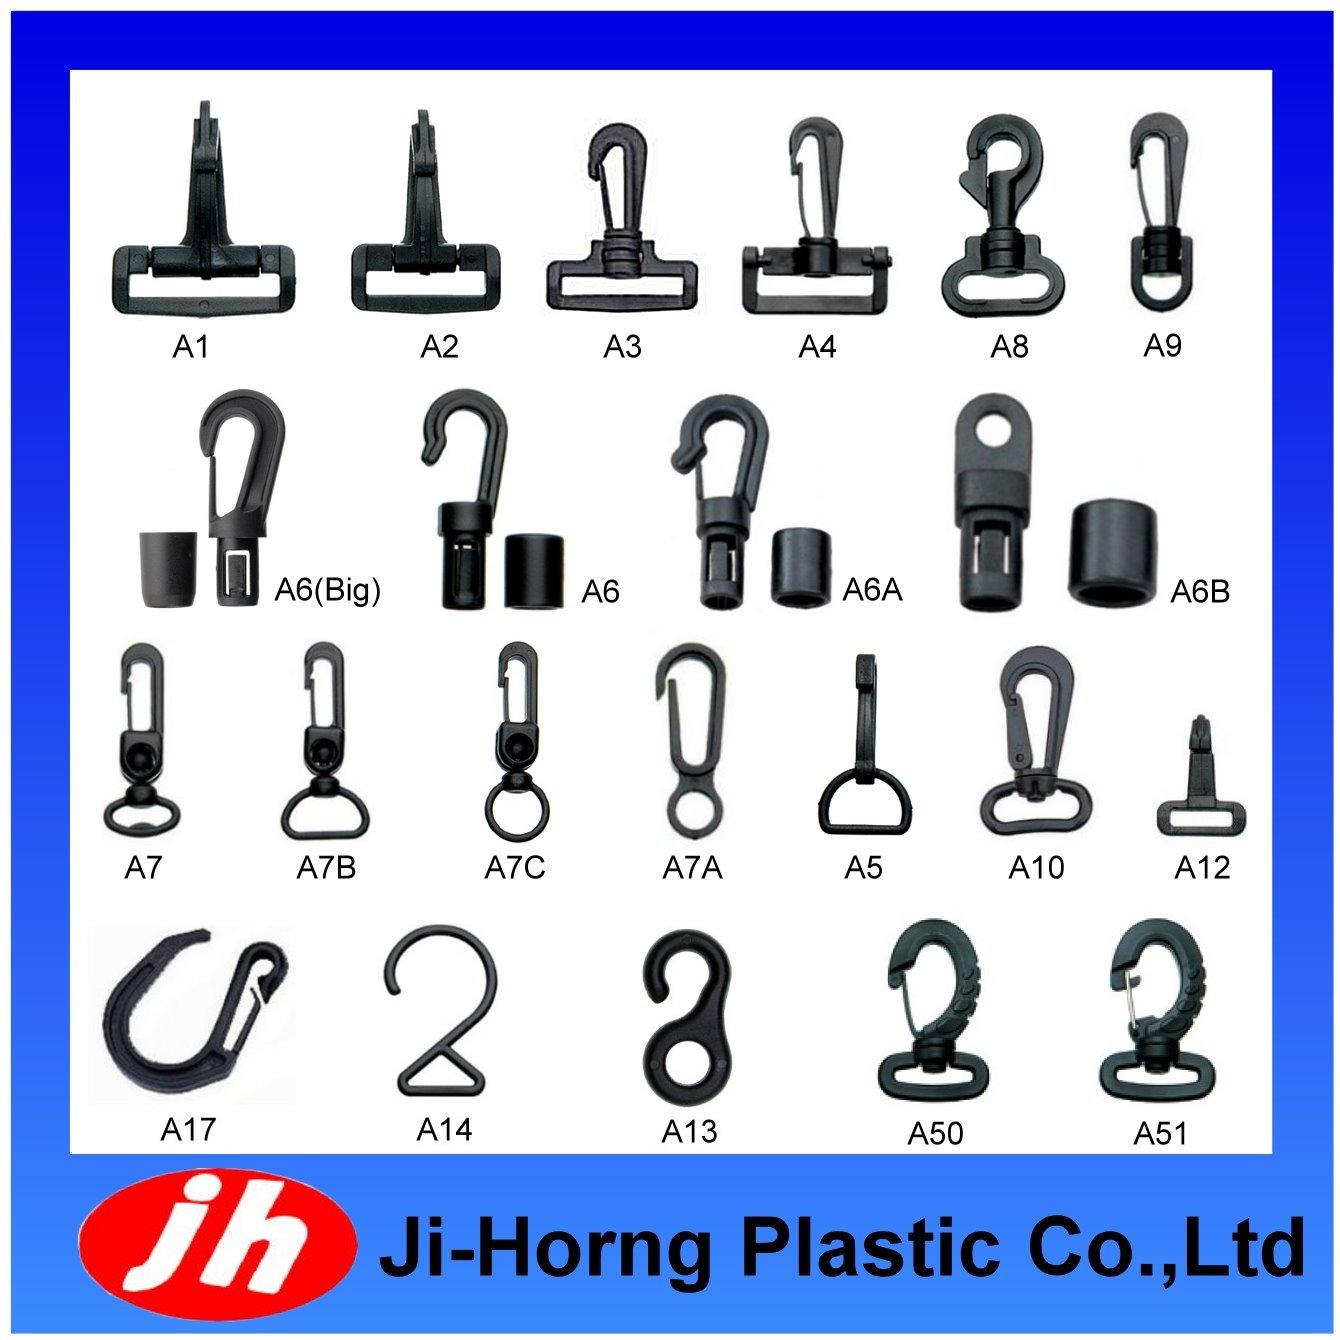 Plastic Snap Rotational Hook/Bungee Cord Hook Buckle(Bag Accessories)